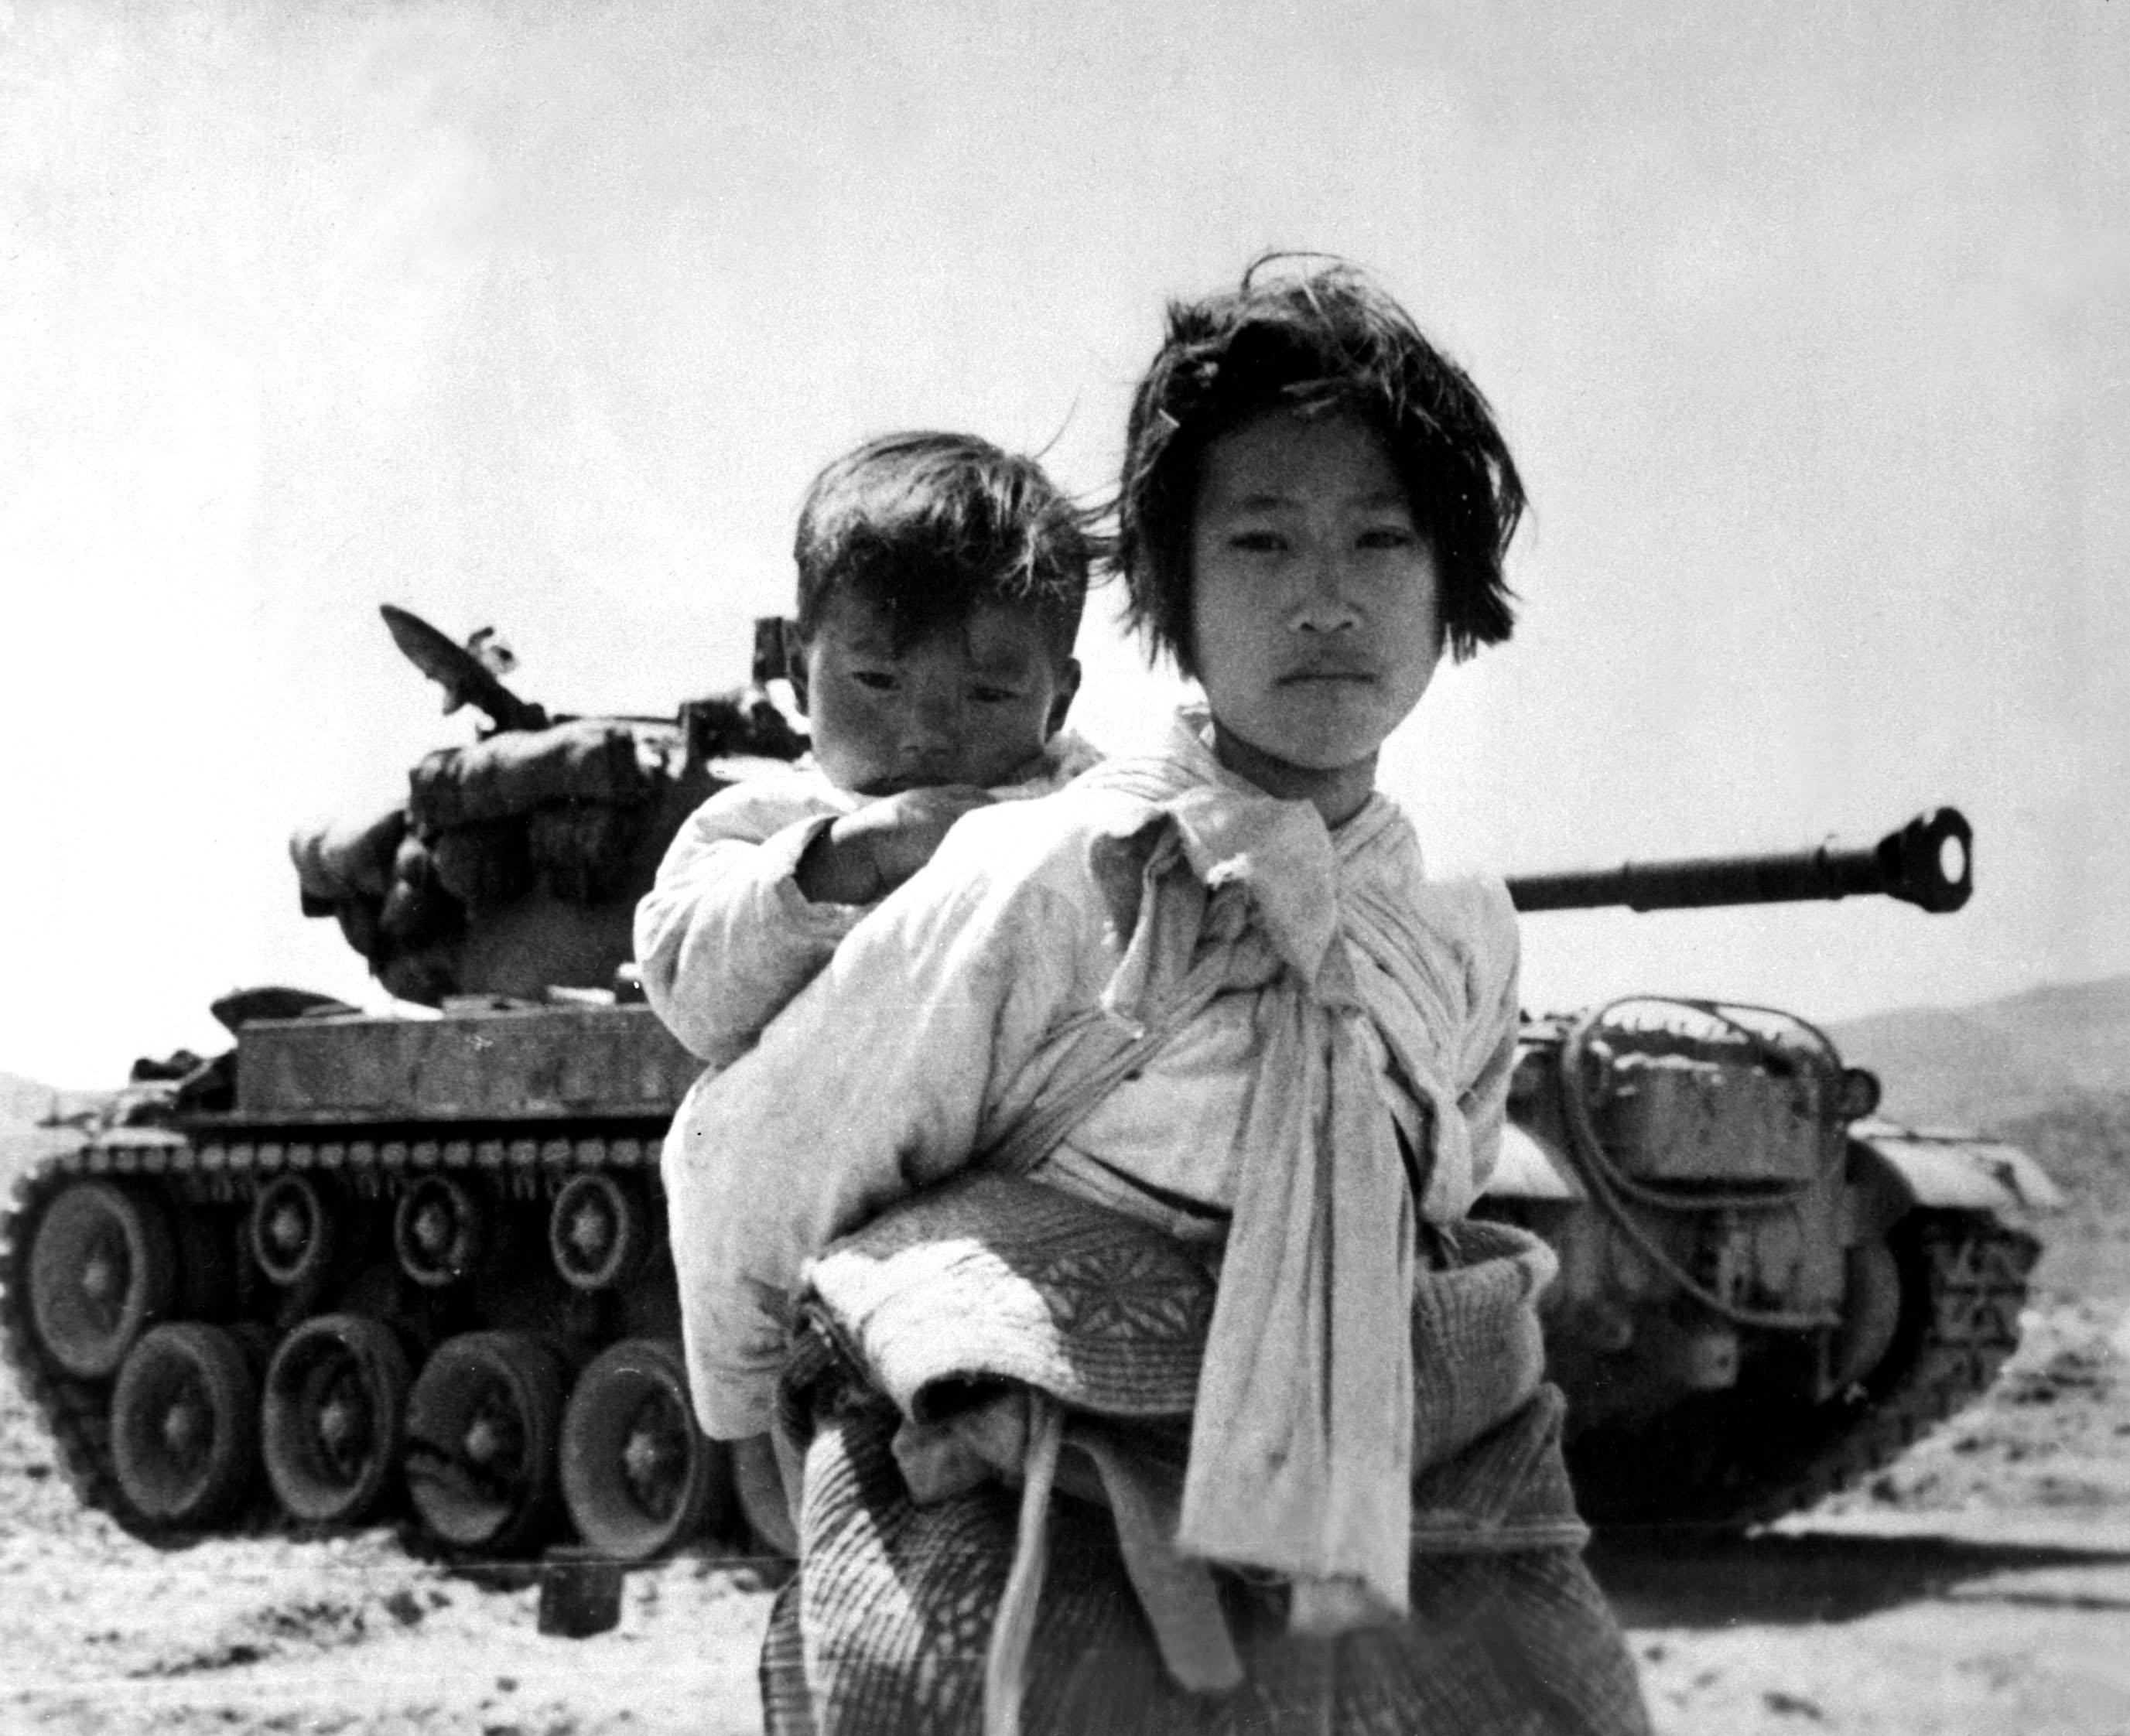 The American invasion of Korea